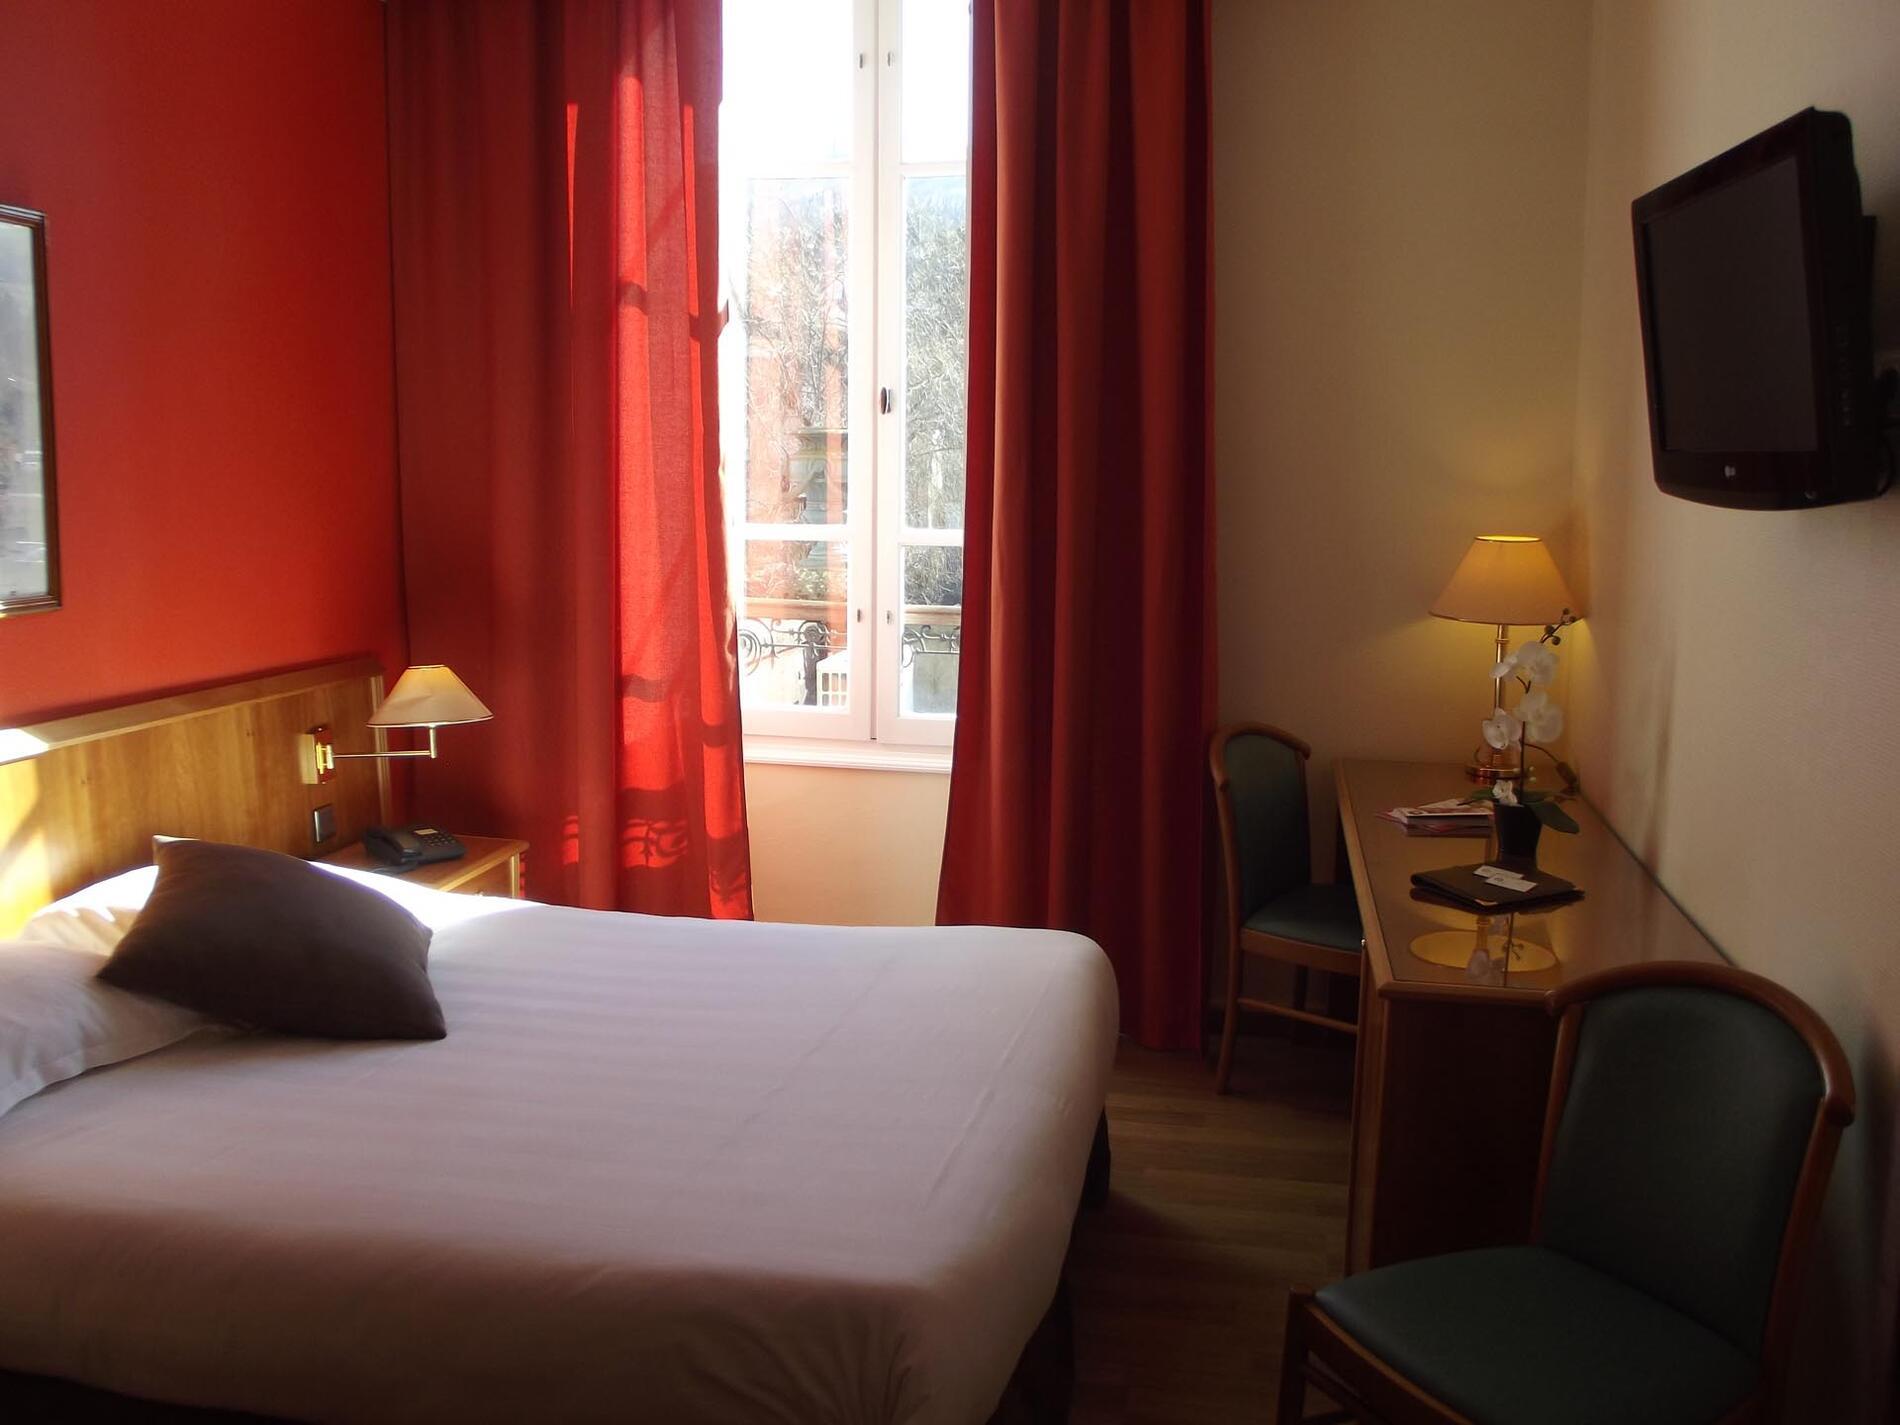 Room at The Originals Boutique, Grand Hôtel Saint-Pierre